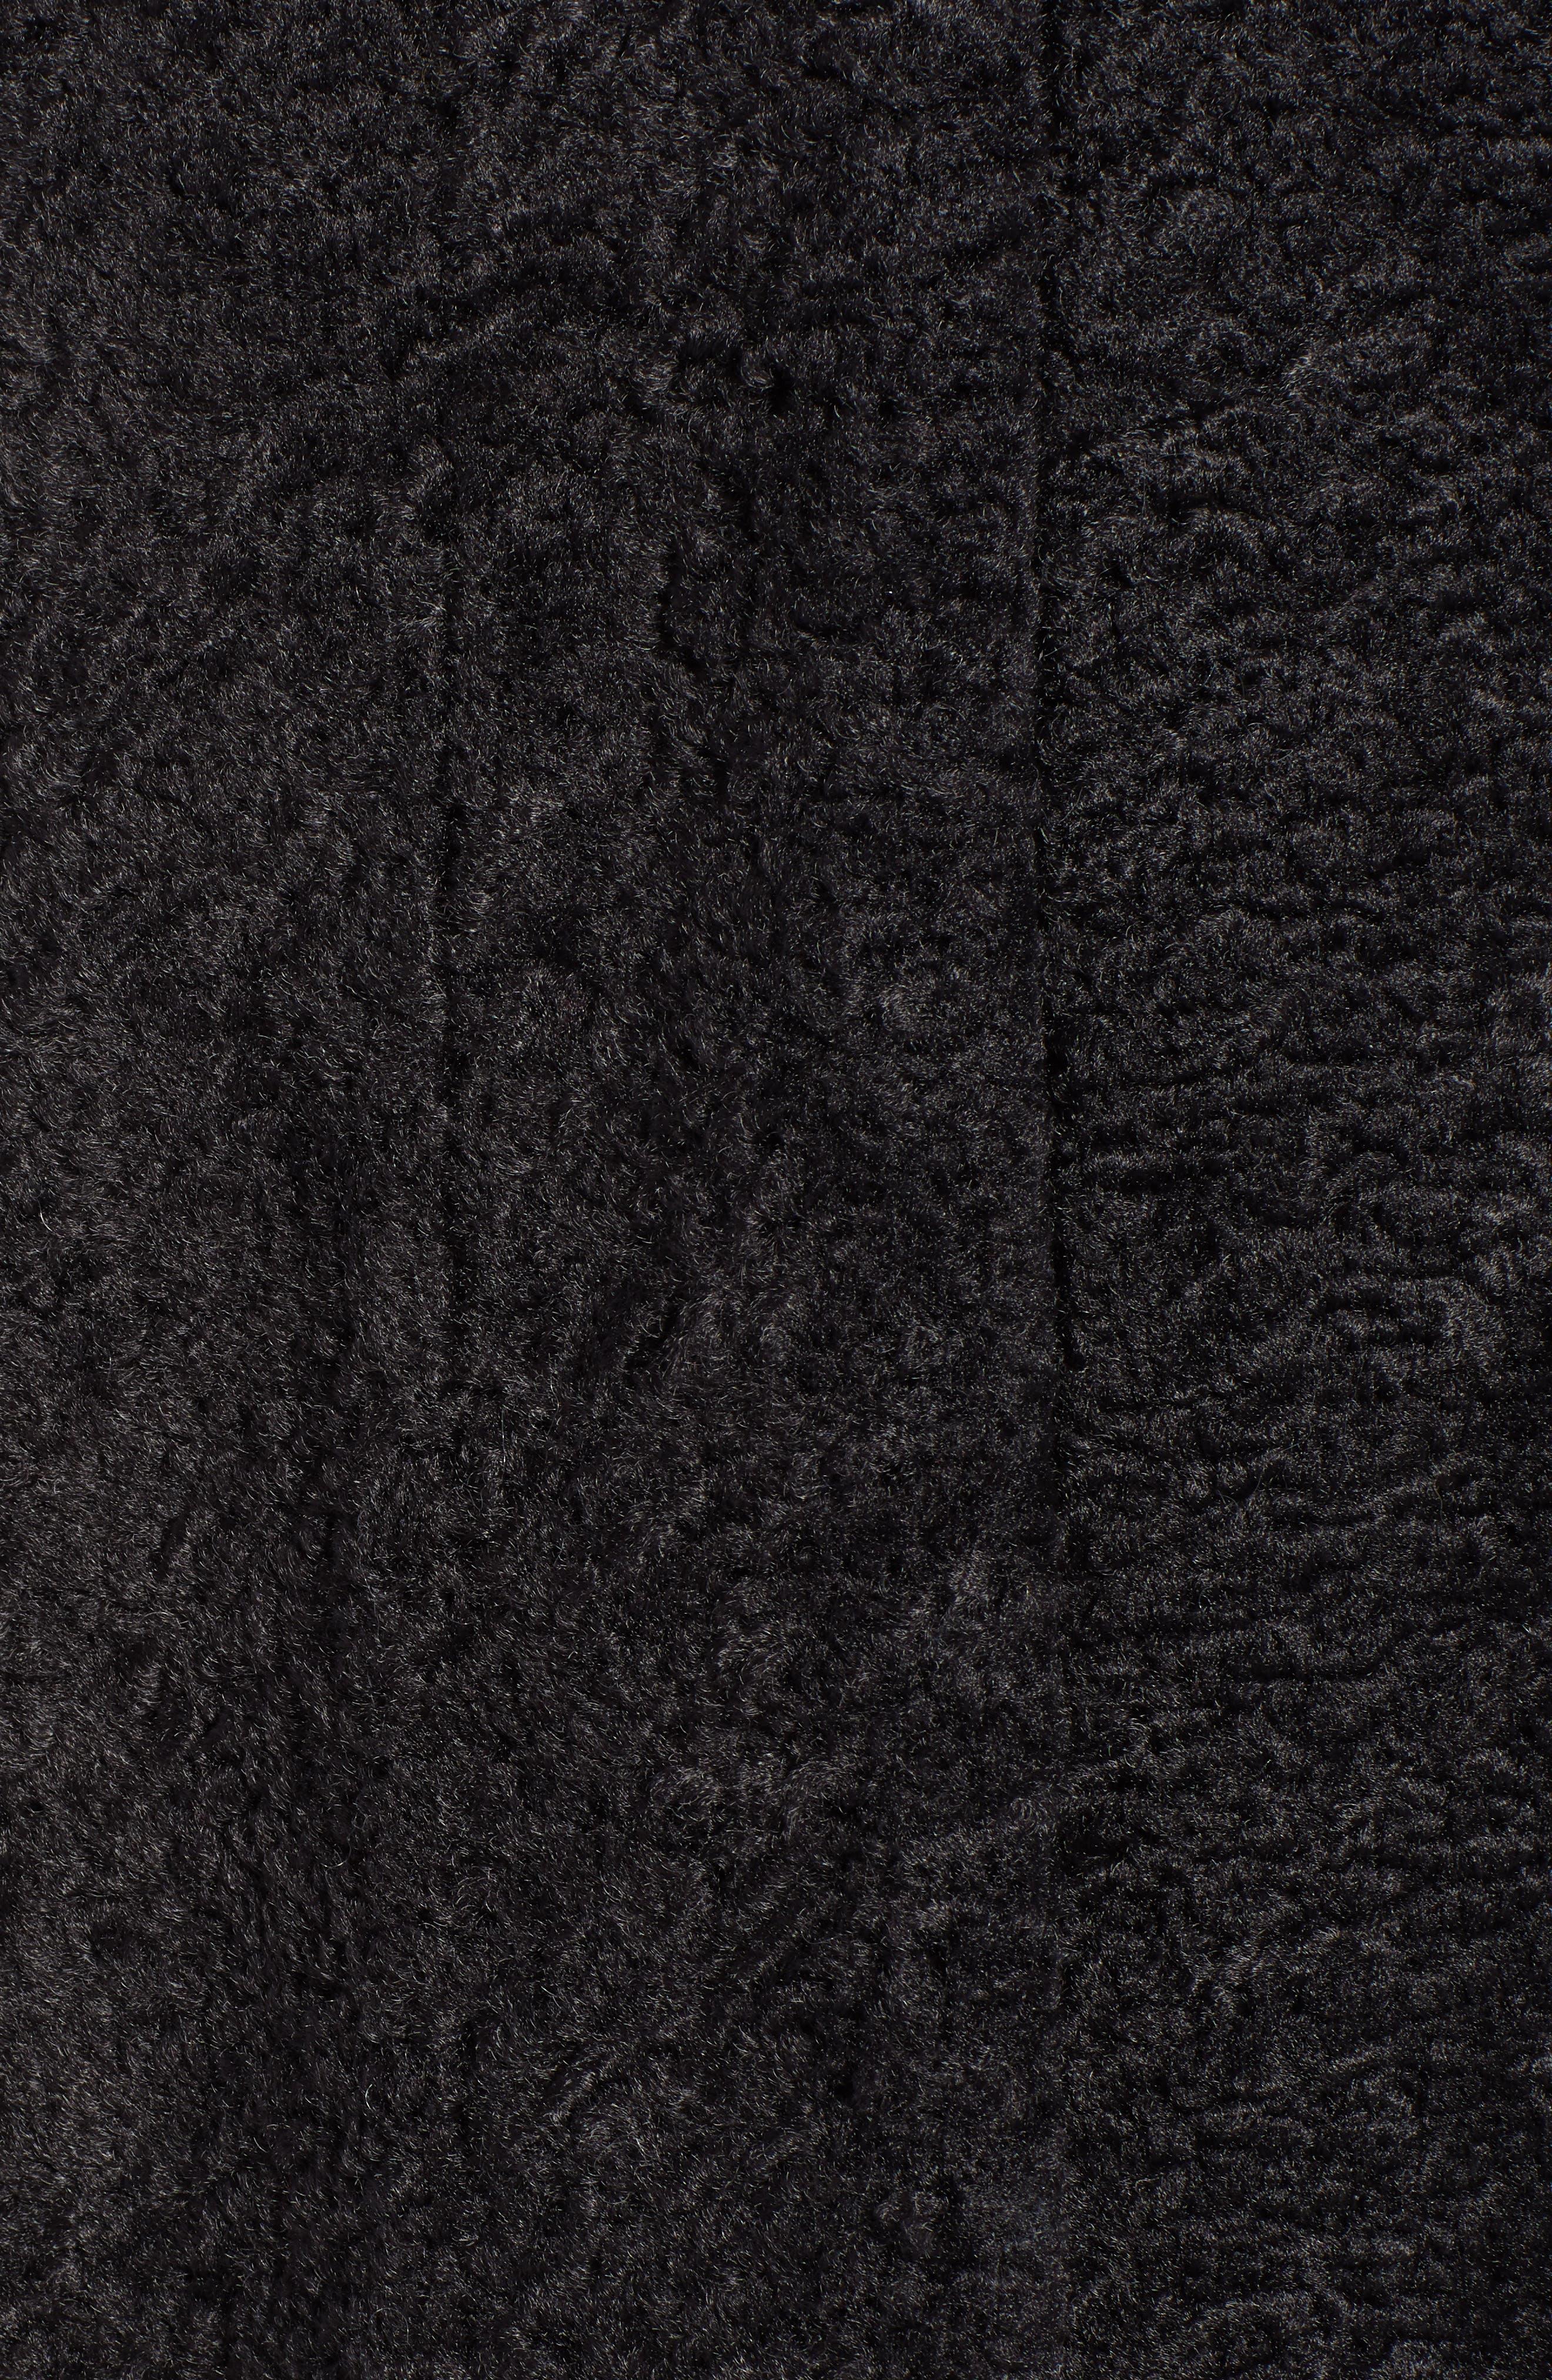 Long Faux Shearling Coat,                             Alternate thumbnail 7, color,                             GREY PHANTOM